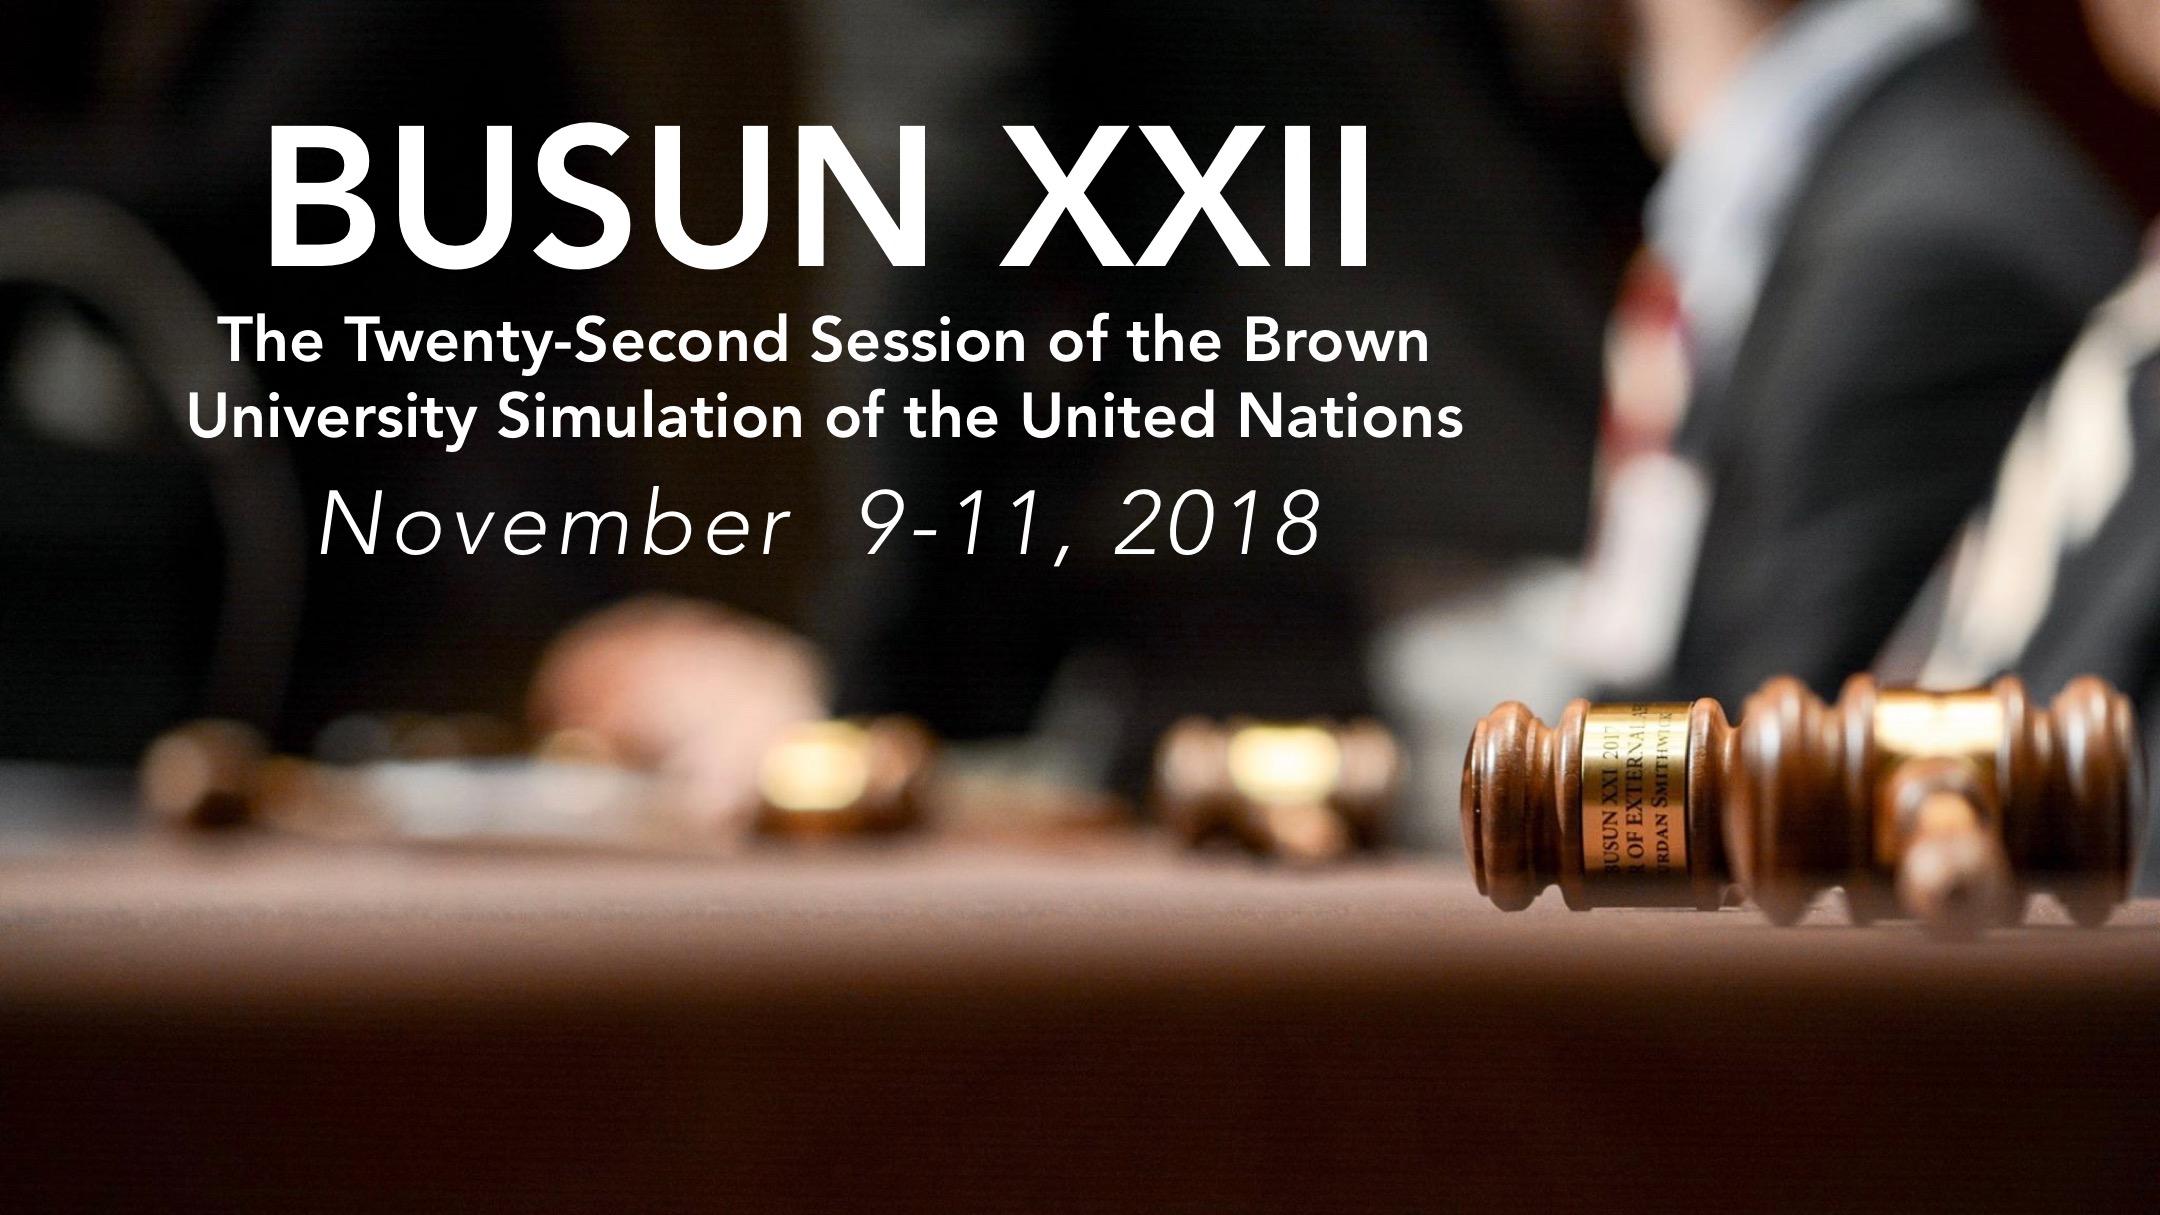 BUSUN XXII - November 9-11 2018